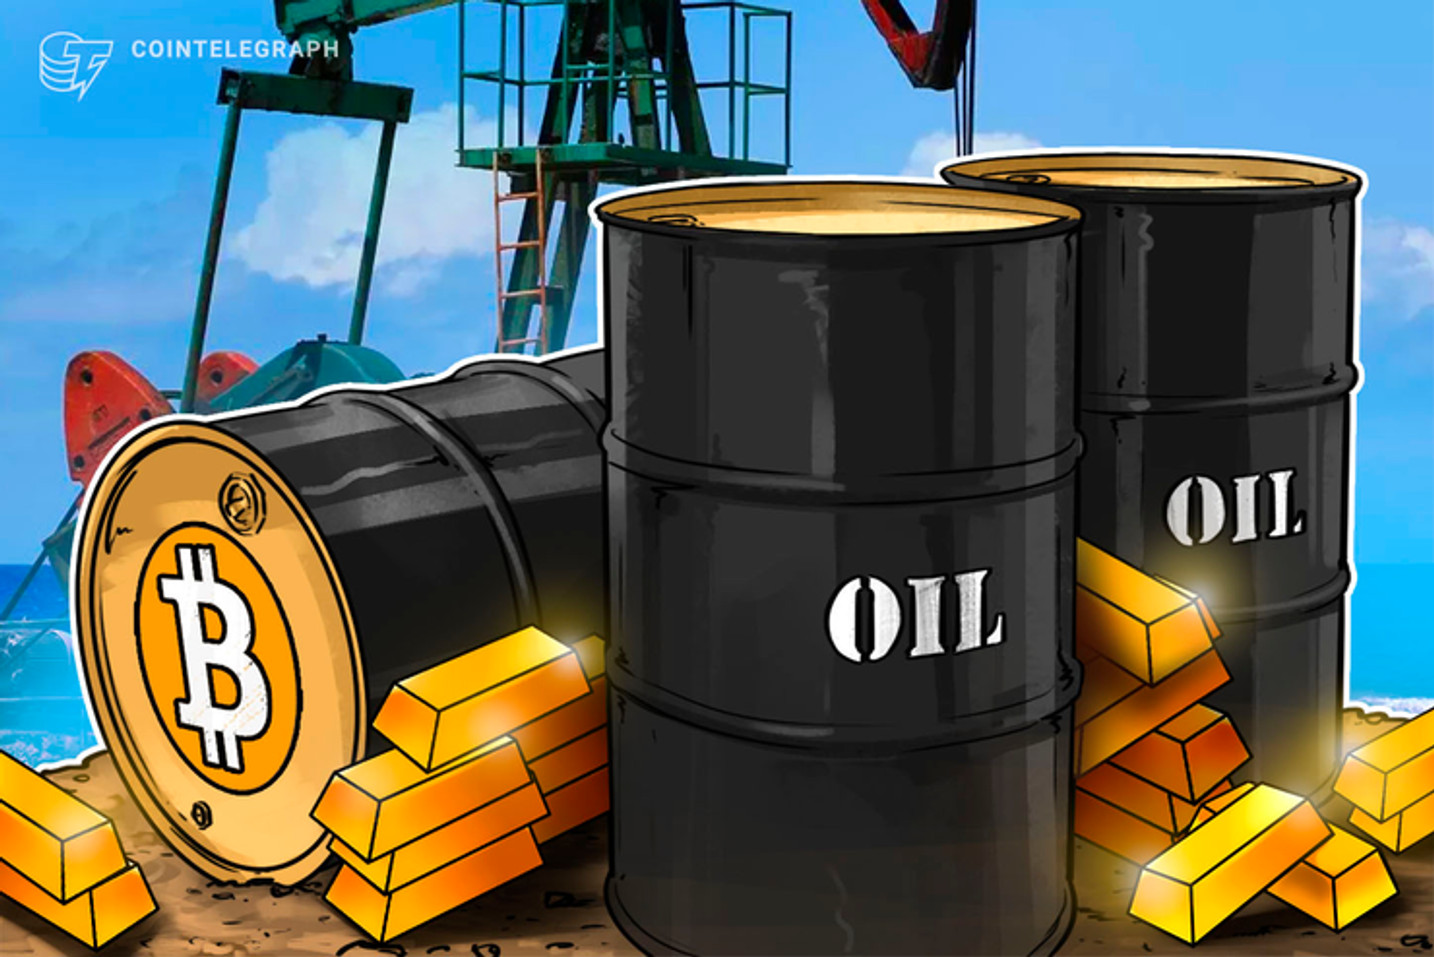 Petróleo despenca mais de 20% e acende alerta no mercado de investimento, Bitcoin cai 10%